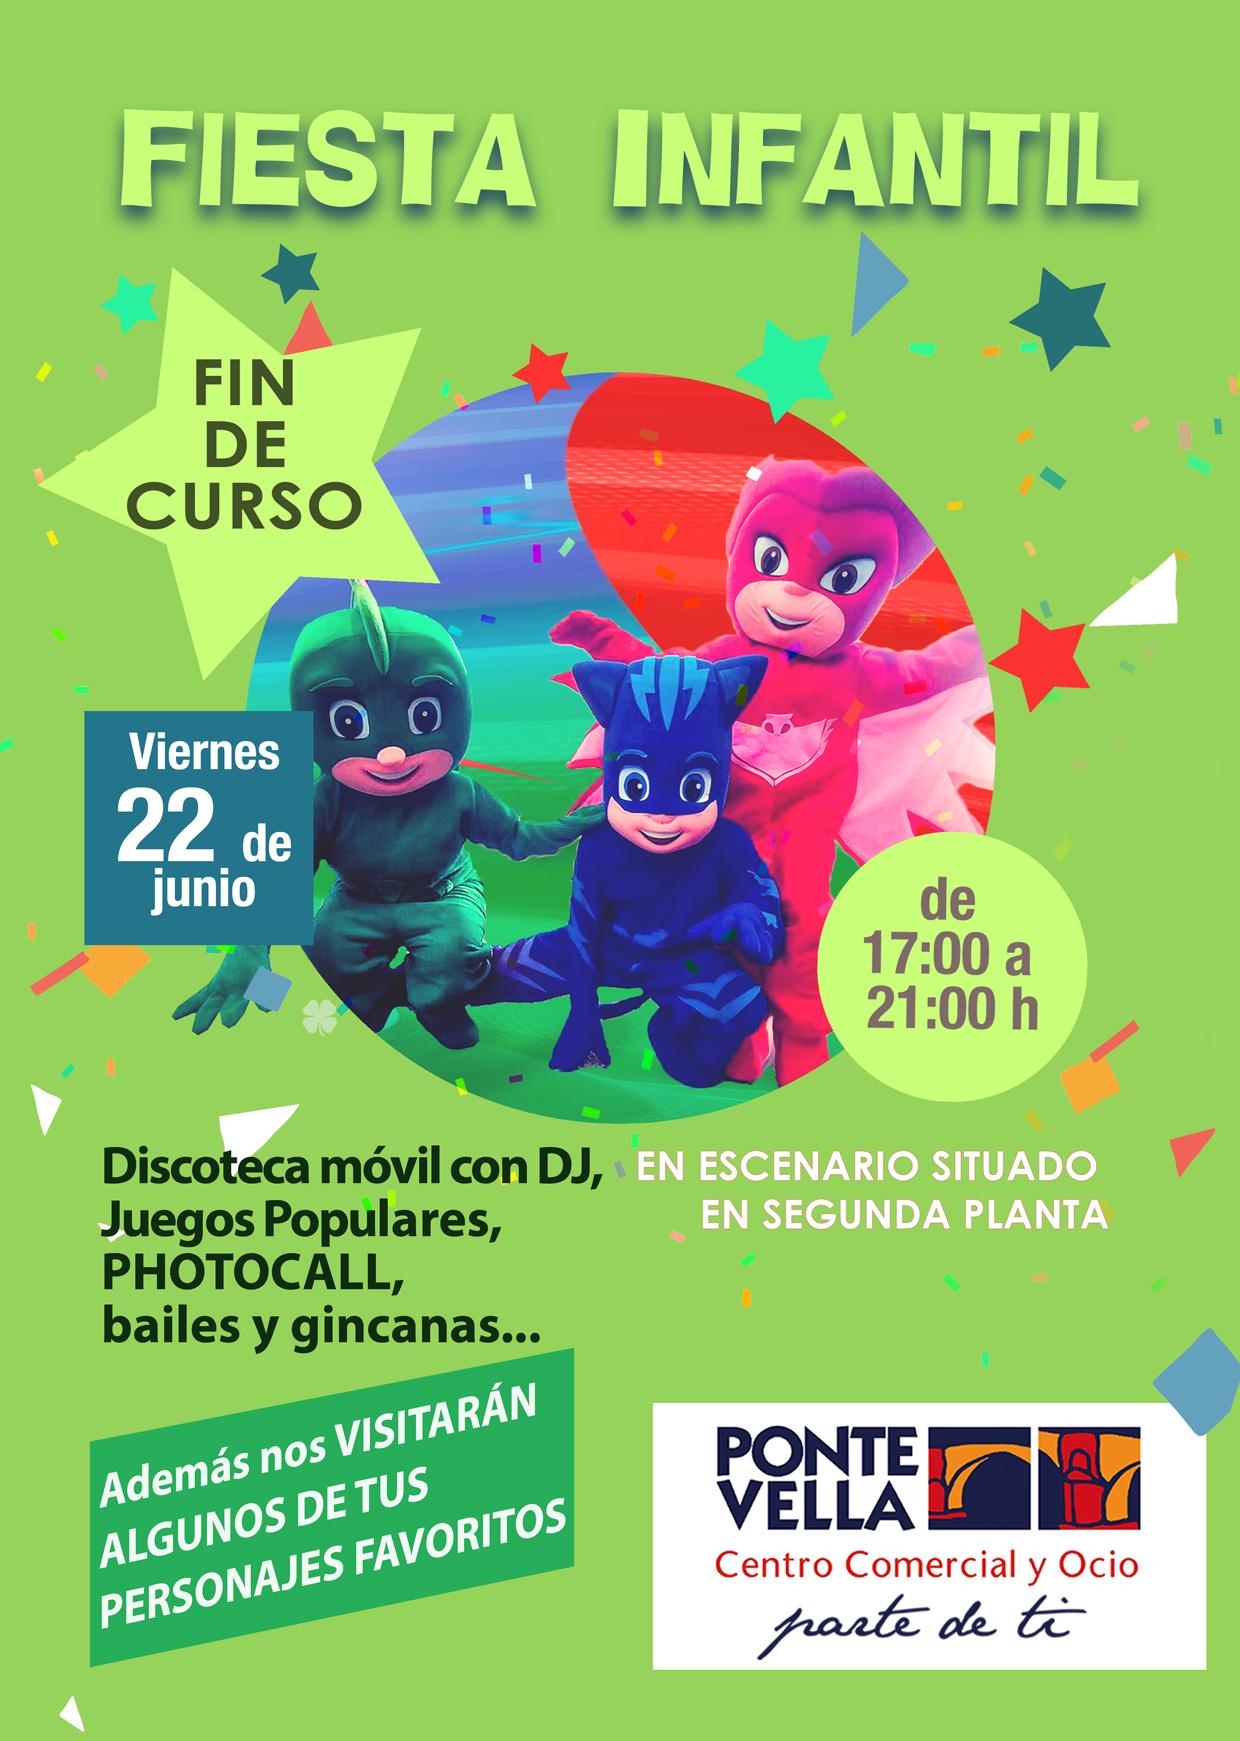 Fiesta Infantil Fin de Curso